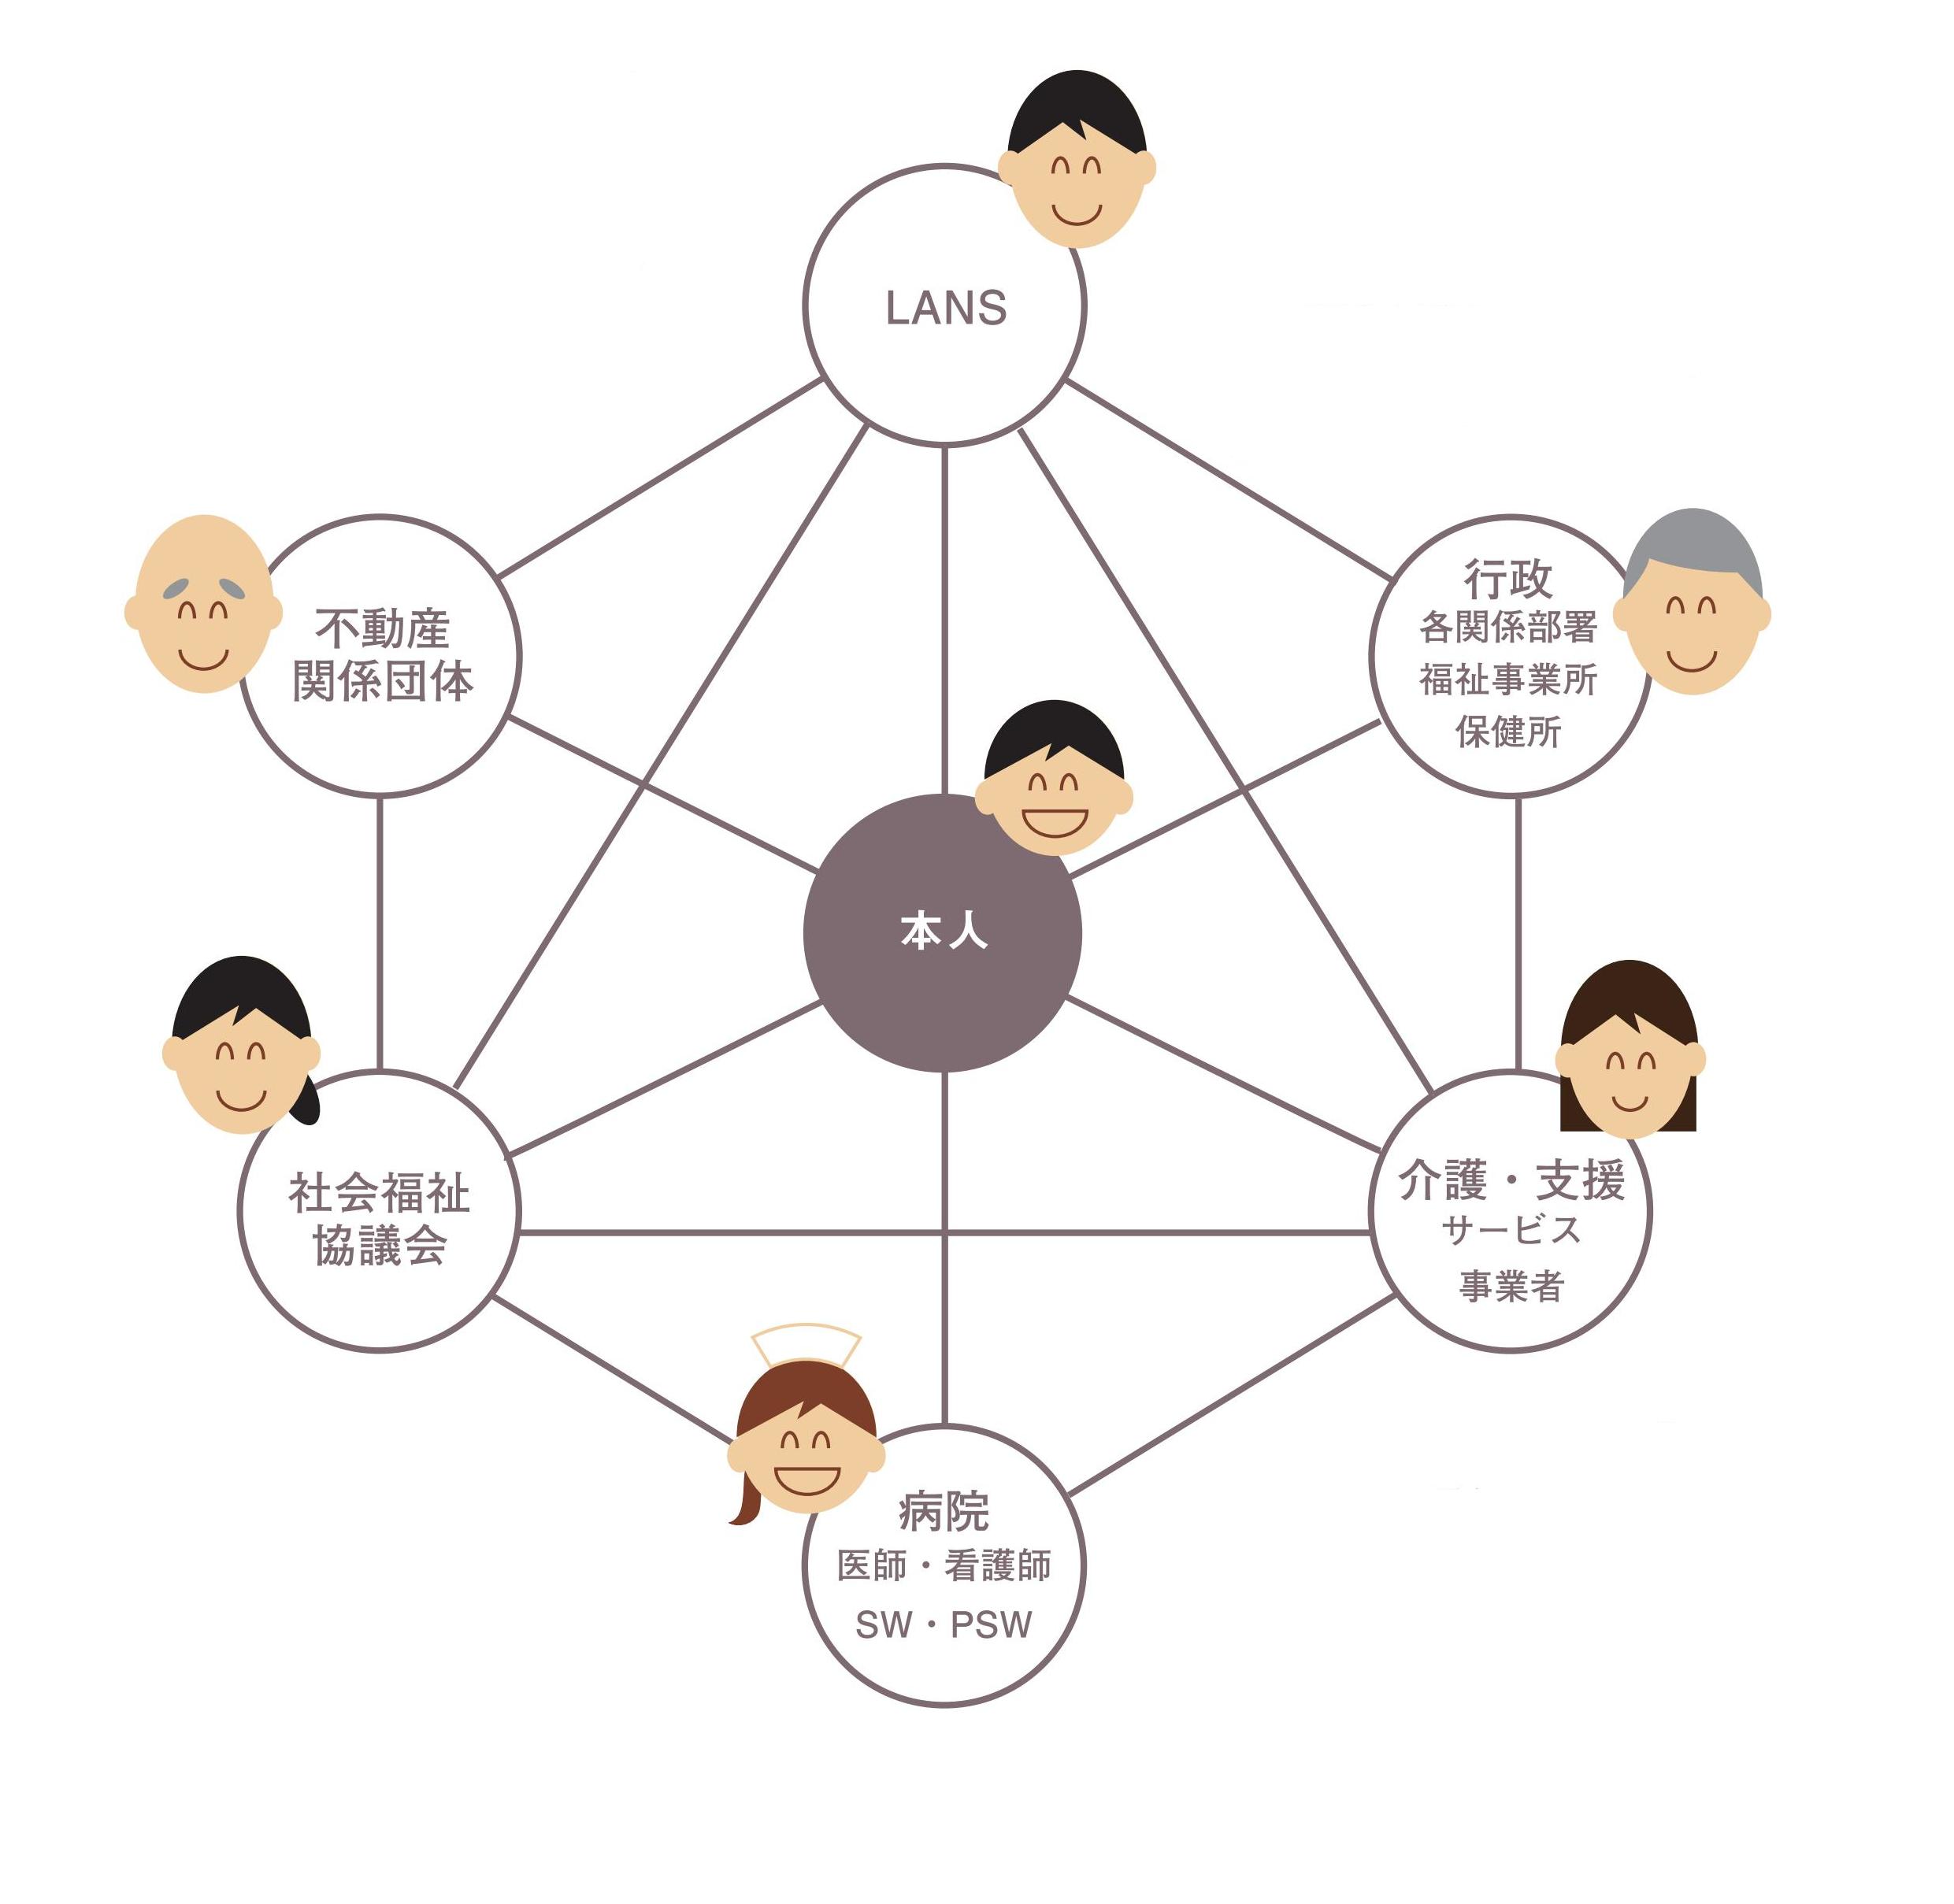 LANS,不動産関係団体,社会福祉協議会,行政,各関係部署,福祉事業所,保健所,介護,支援サービス事業所,病院,医師,看護師